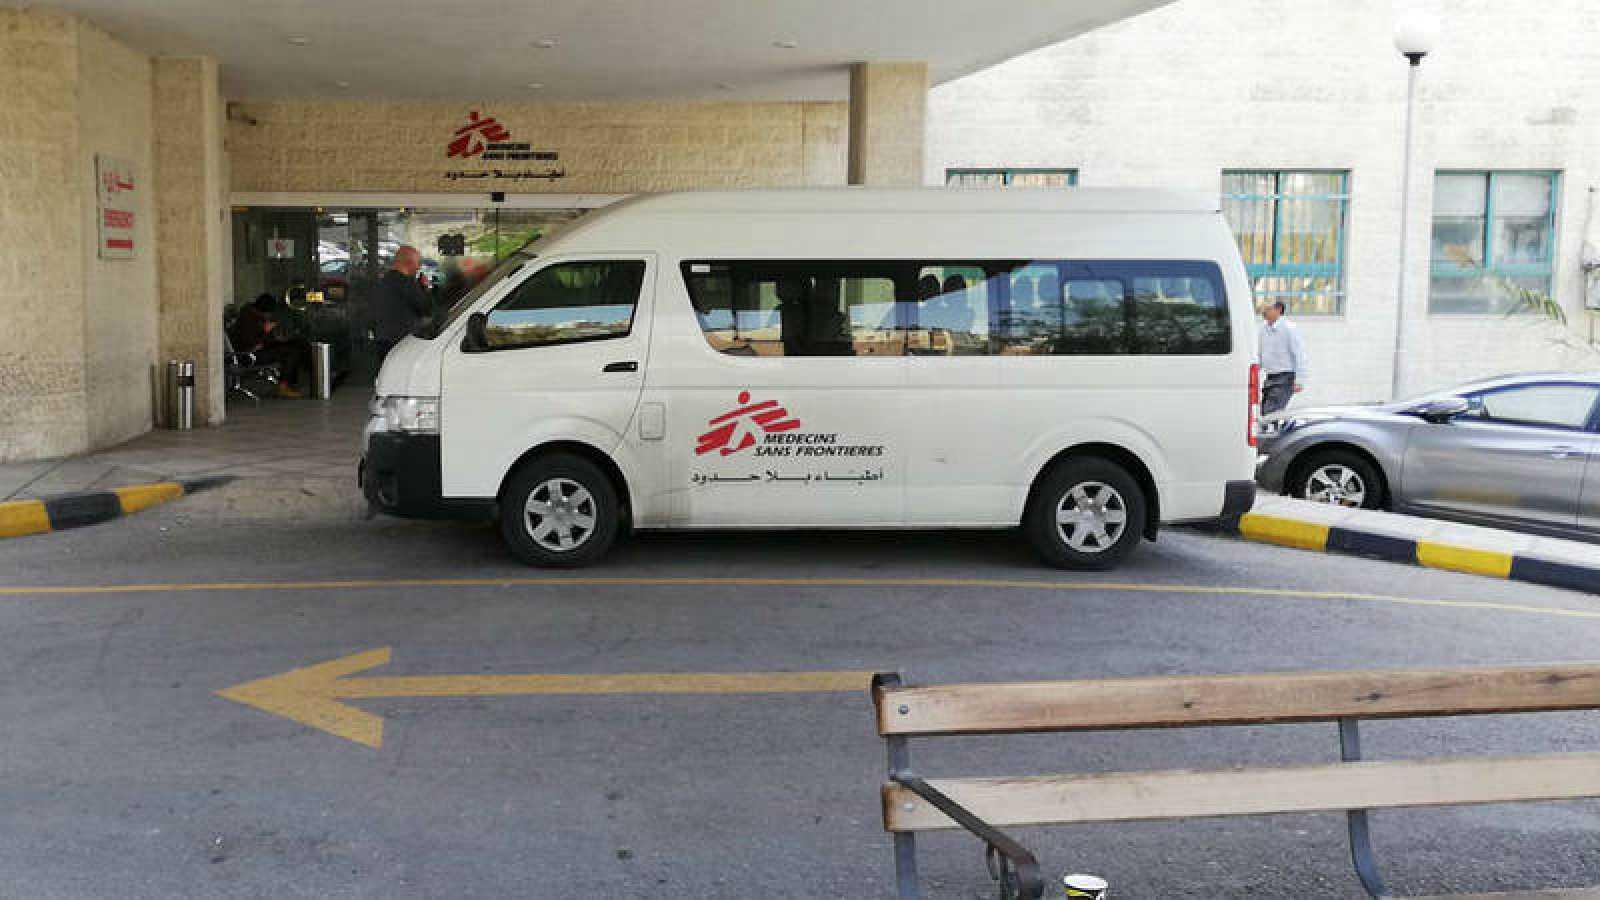 Una ambulancia espera en el Hospital de Cirujía Reconstructiva de MSF